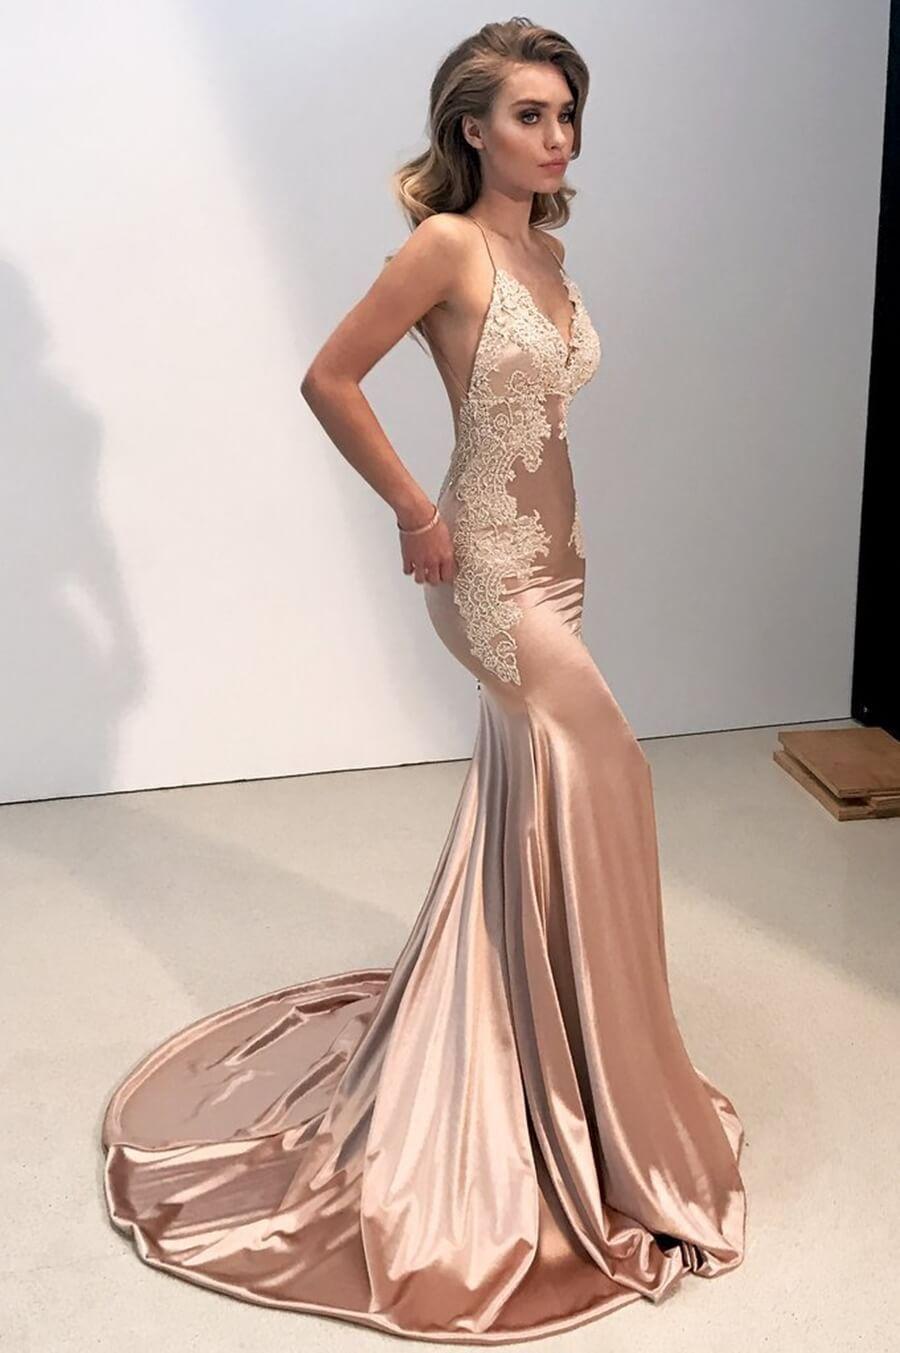 E6d8545daa42d5ced125a4bf747b3688 Prom Dresses Lace Prom Party Dresses Prom Dresses [ 1353 x 900 Pixel ]